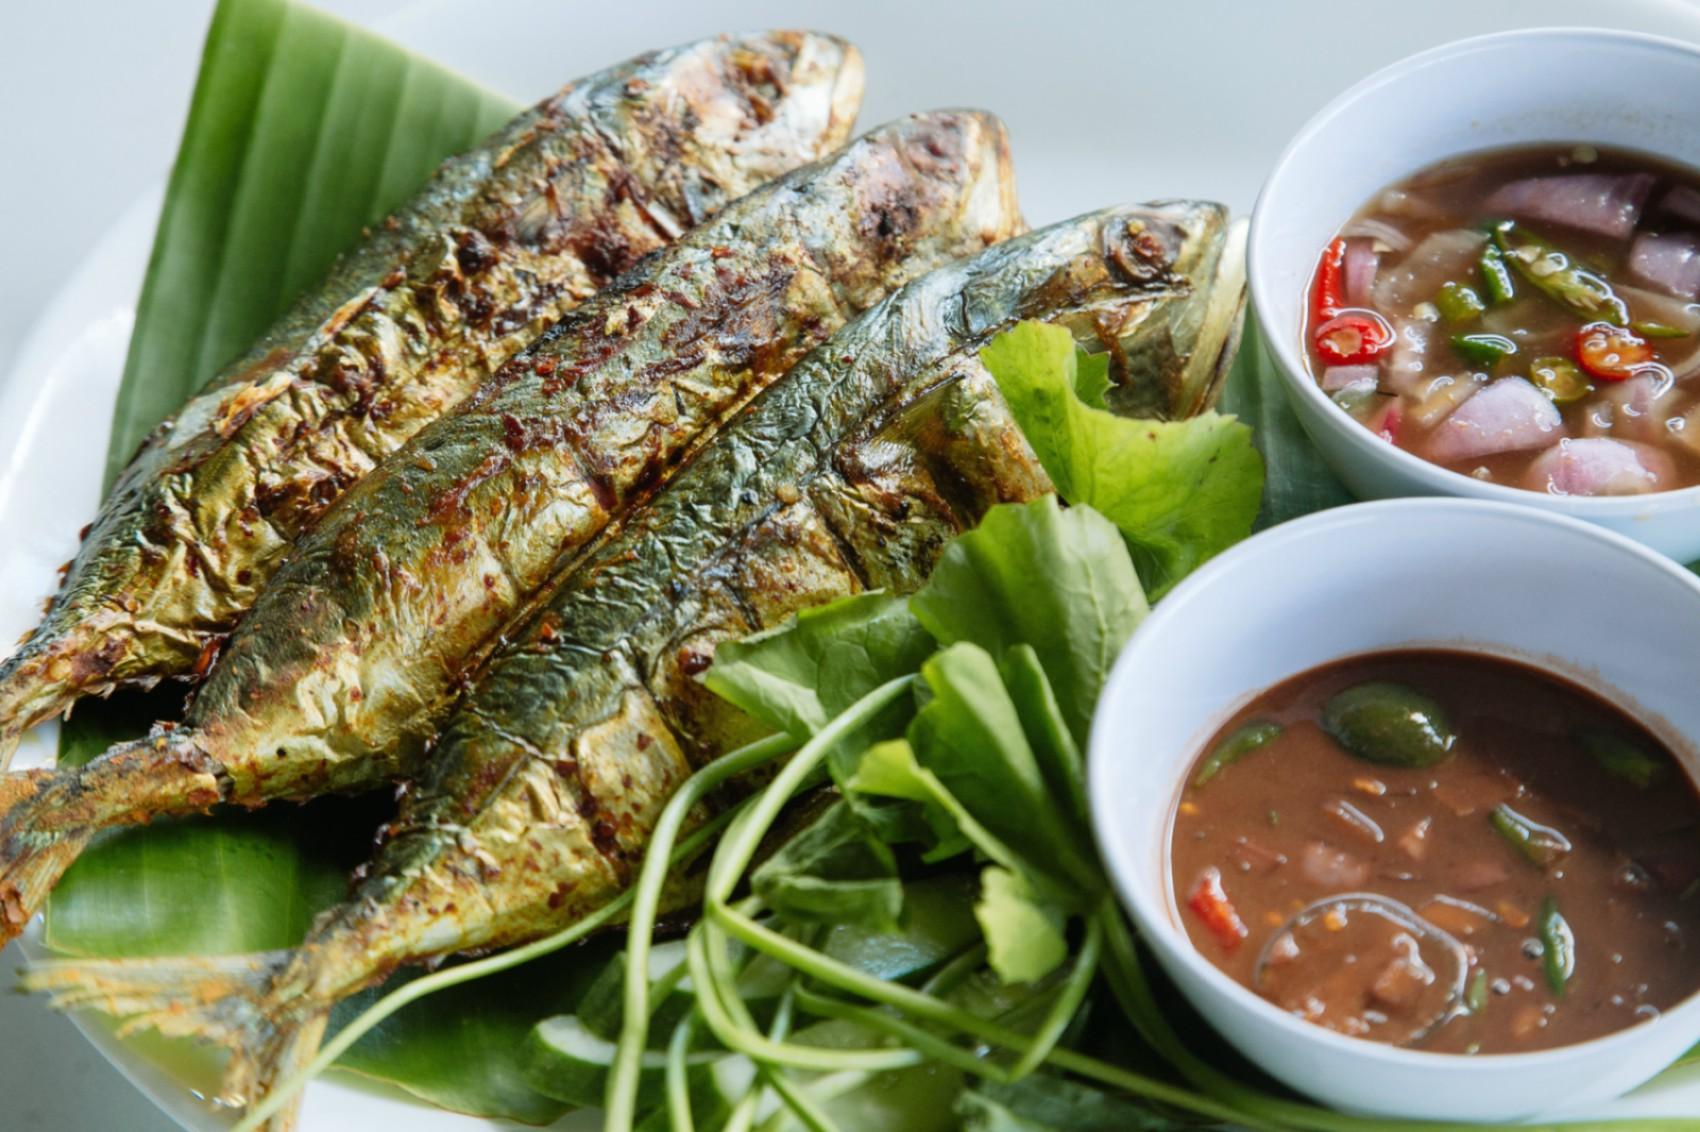 jalan jalan cari makan  picks Resepi Ikan Bakar Berempah Terengganu Enak dan Mudah